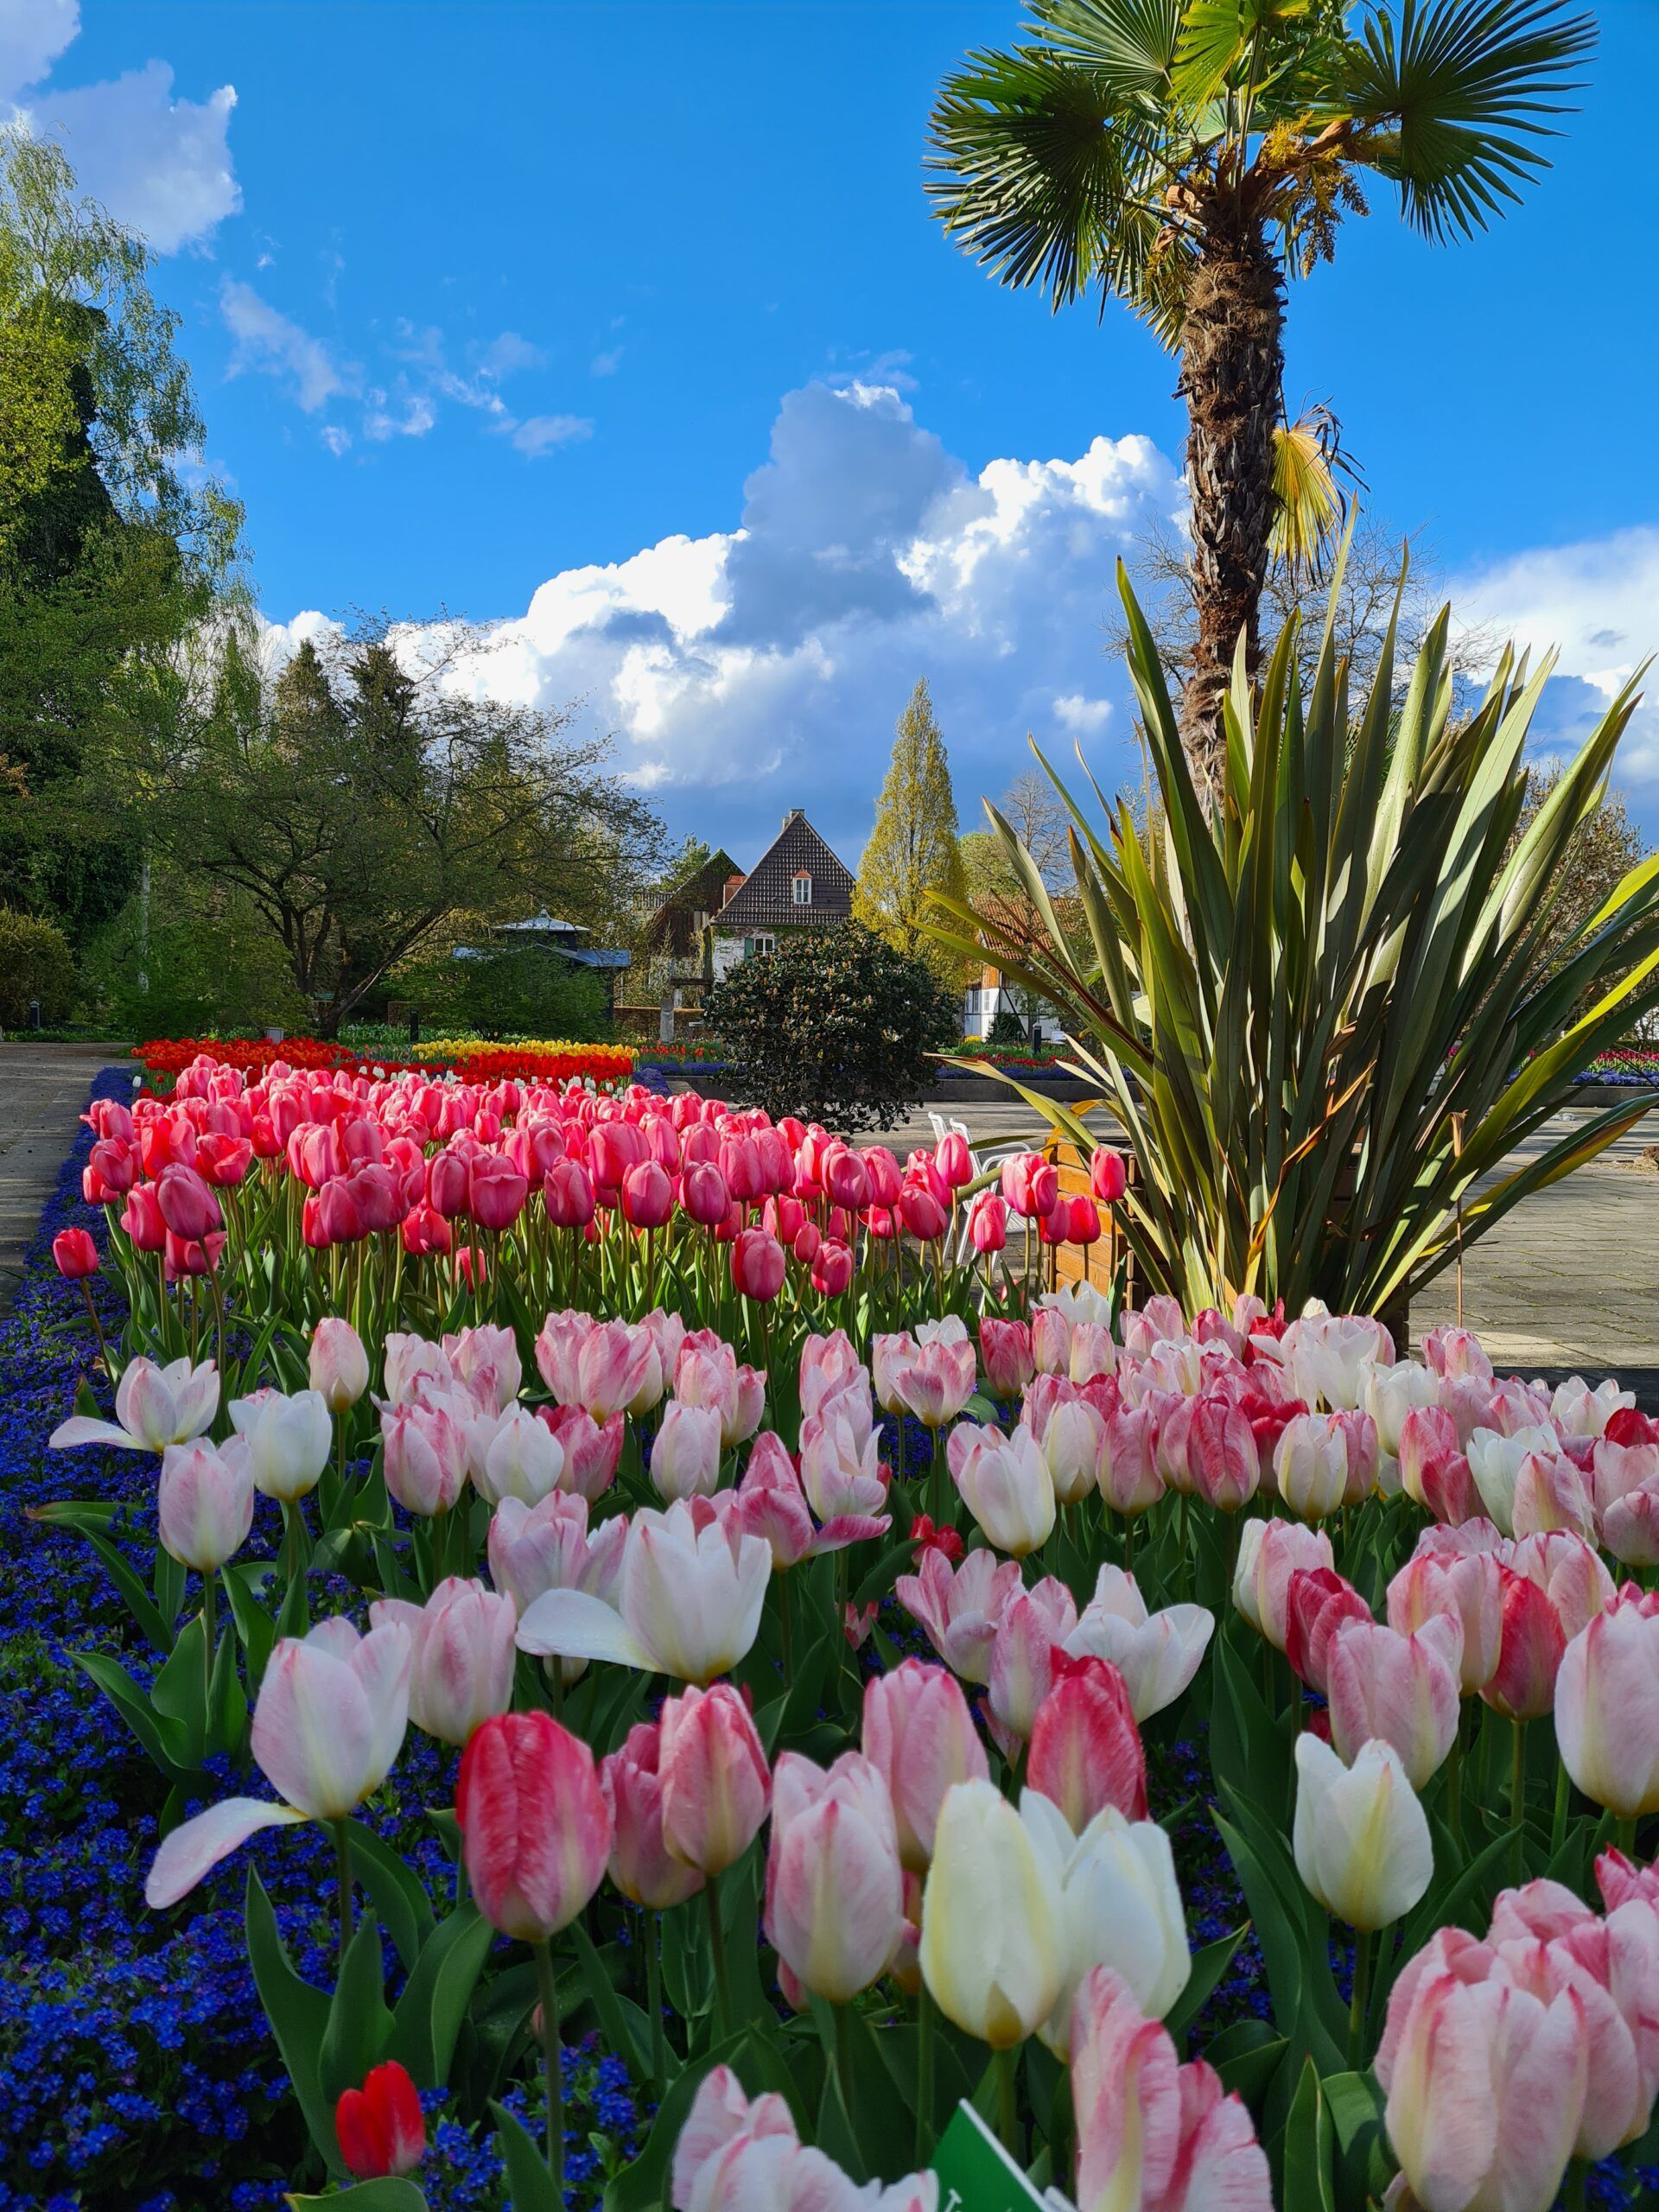 2 05 10 Bild 1 Bot Garten Tulpen Scaled